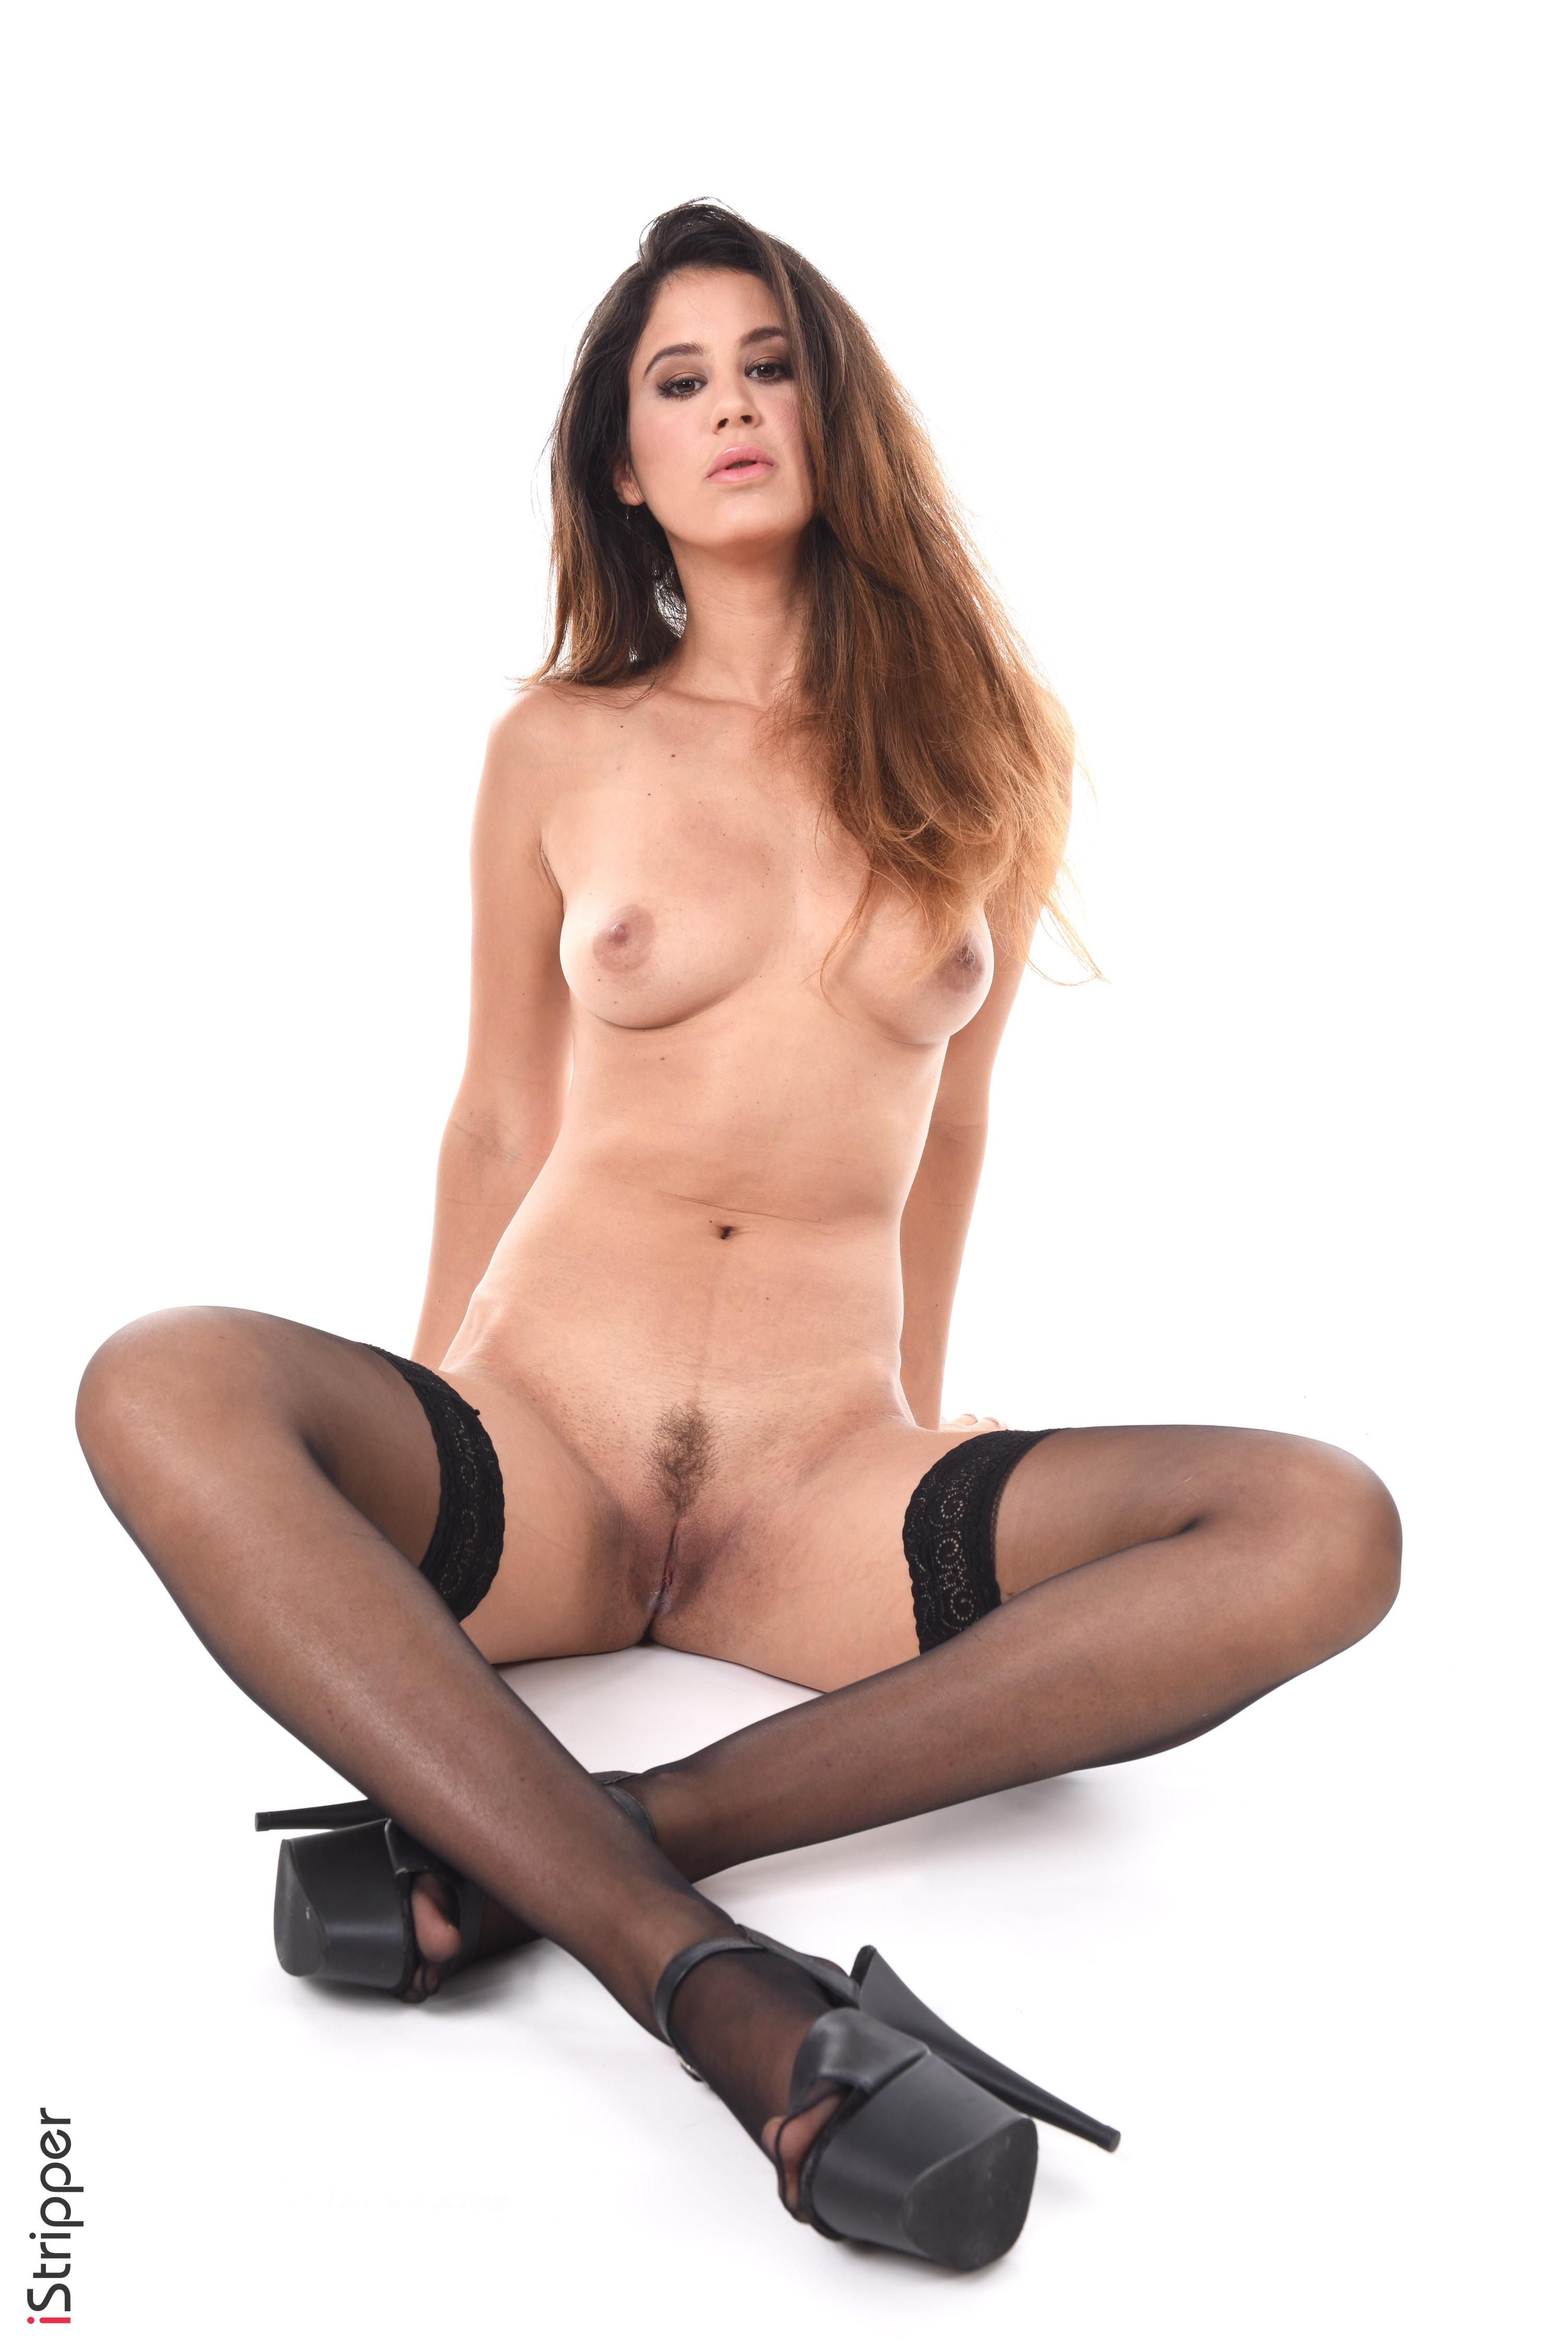 sexy striptease curvy body